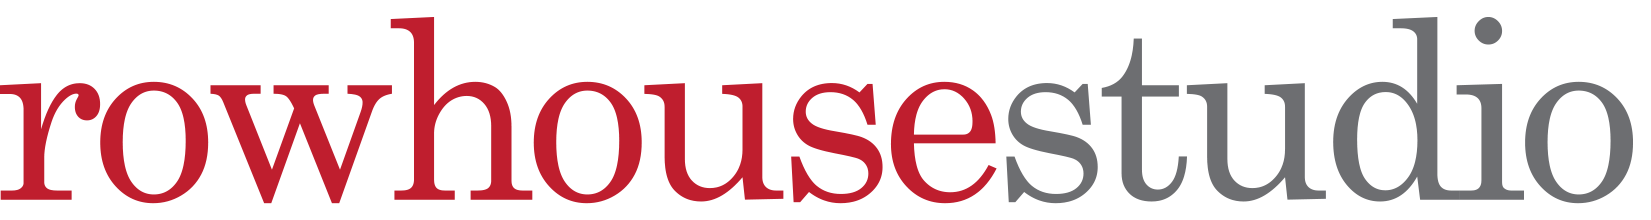 RowHouse Studio